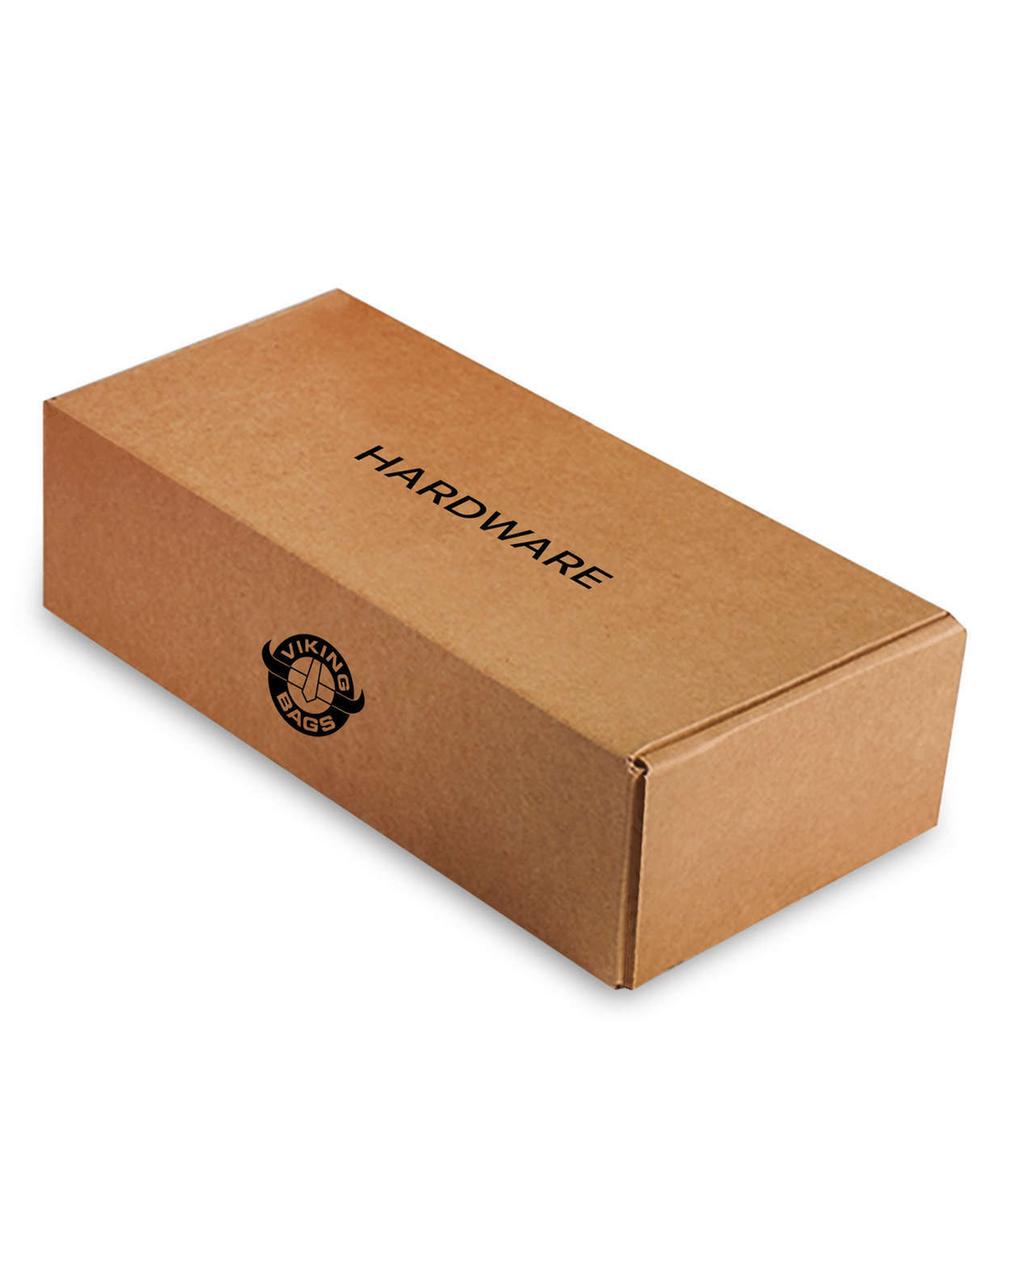 Honda VTX 1800 N Slanted Motorcycle Saddlebags Box